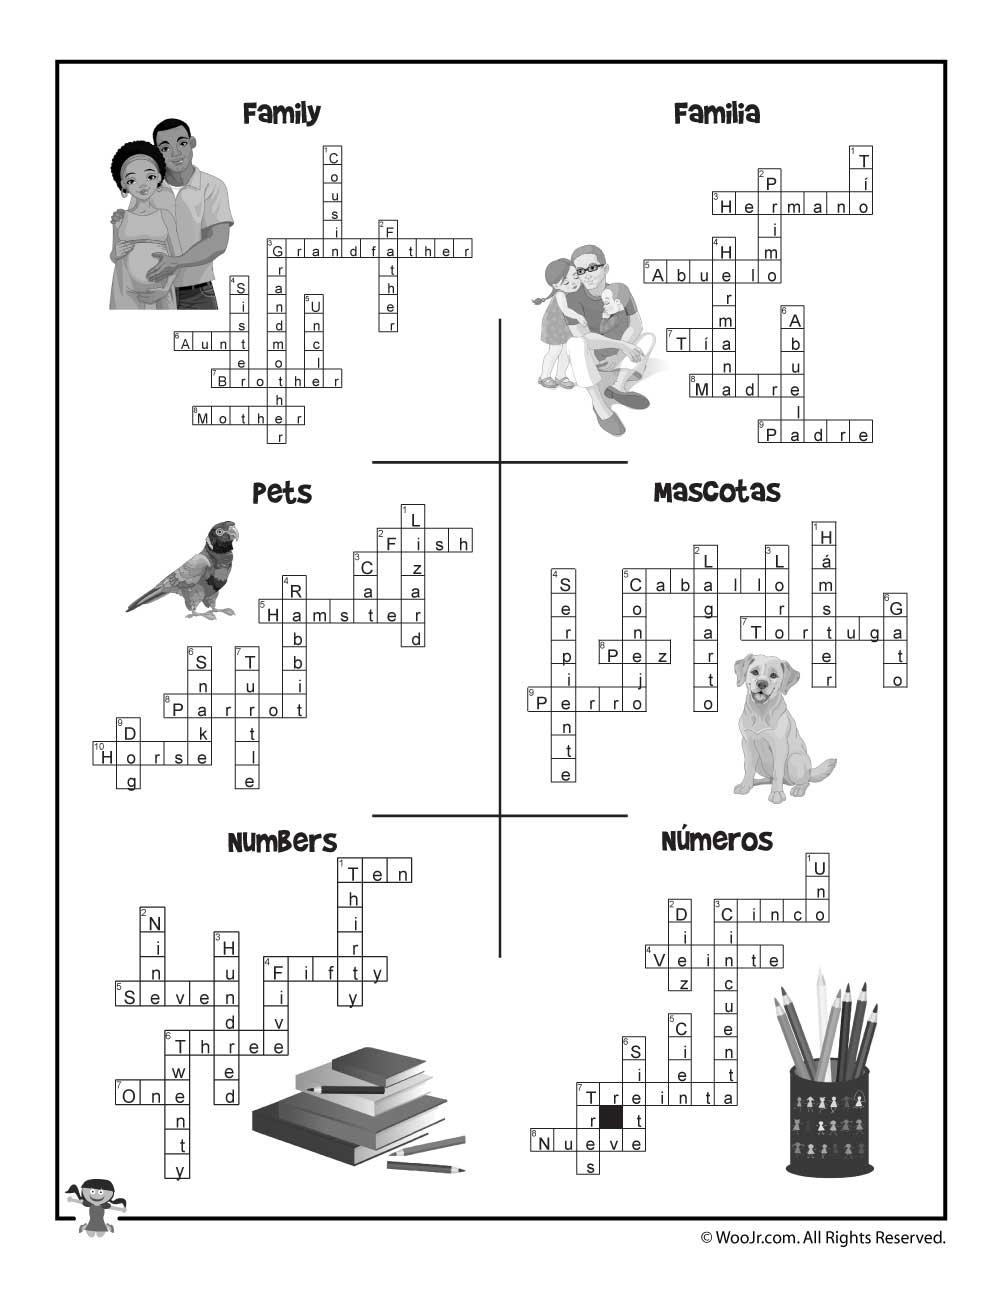 Esl Worksheet Crossword Puzzle Answers | Woo! Jr. Kids Activities - Printable Crossword Puzzles Spanish